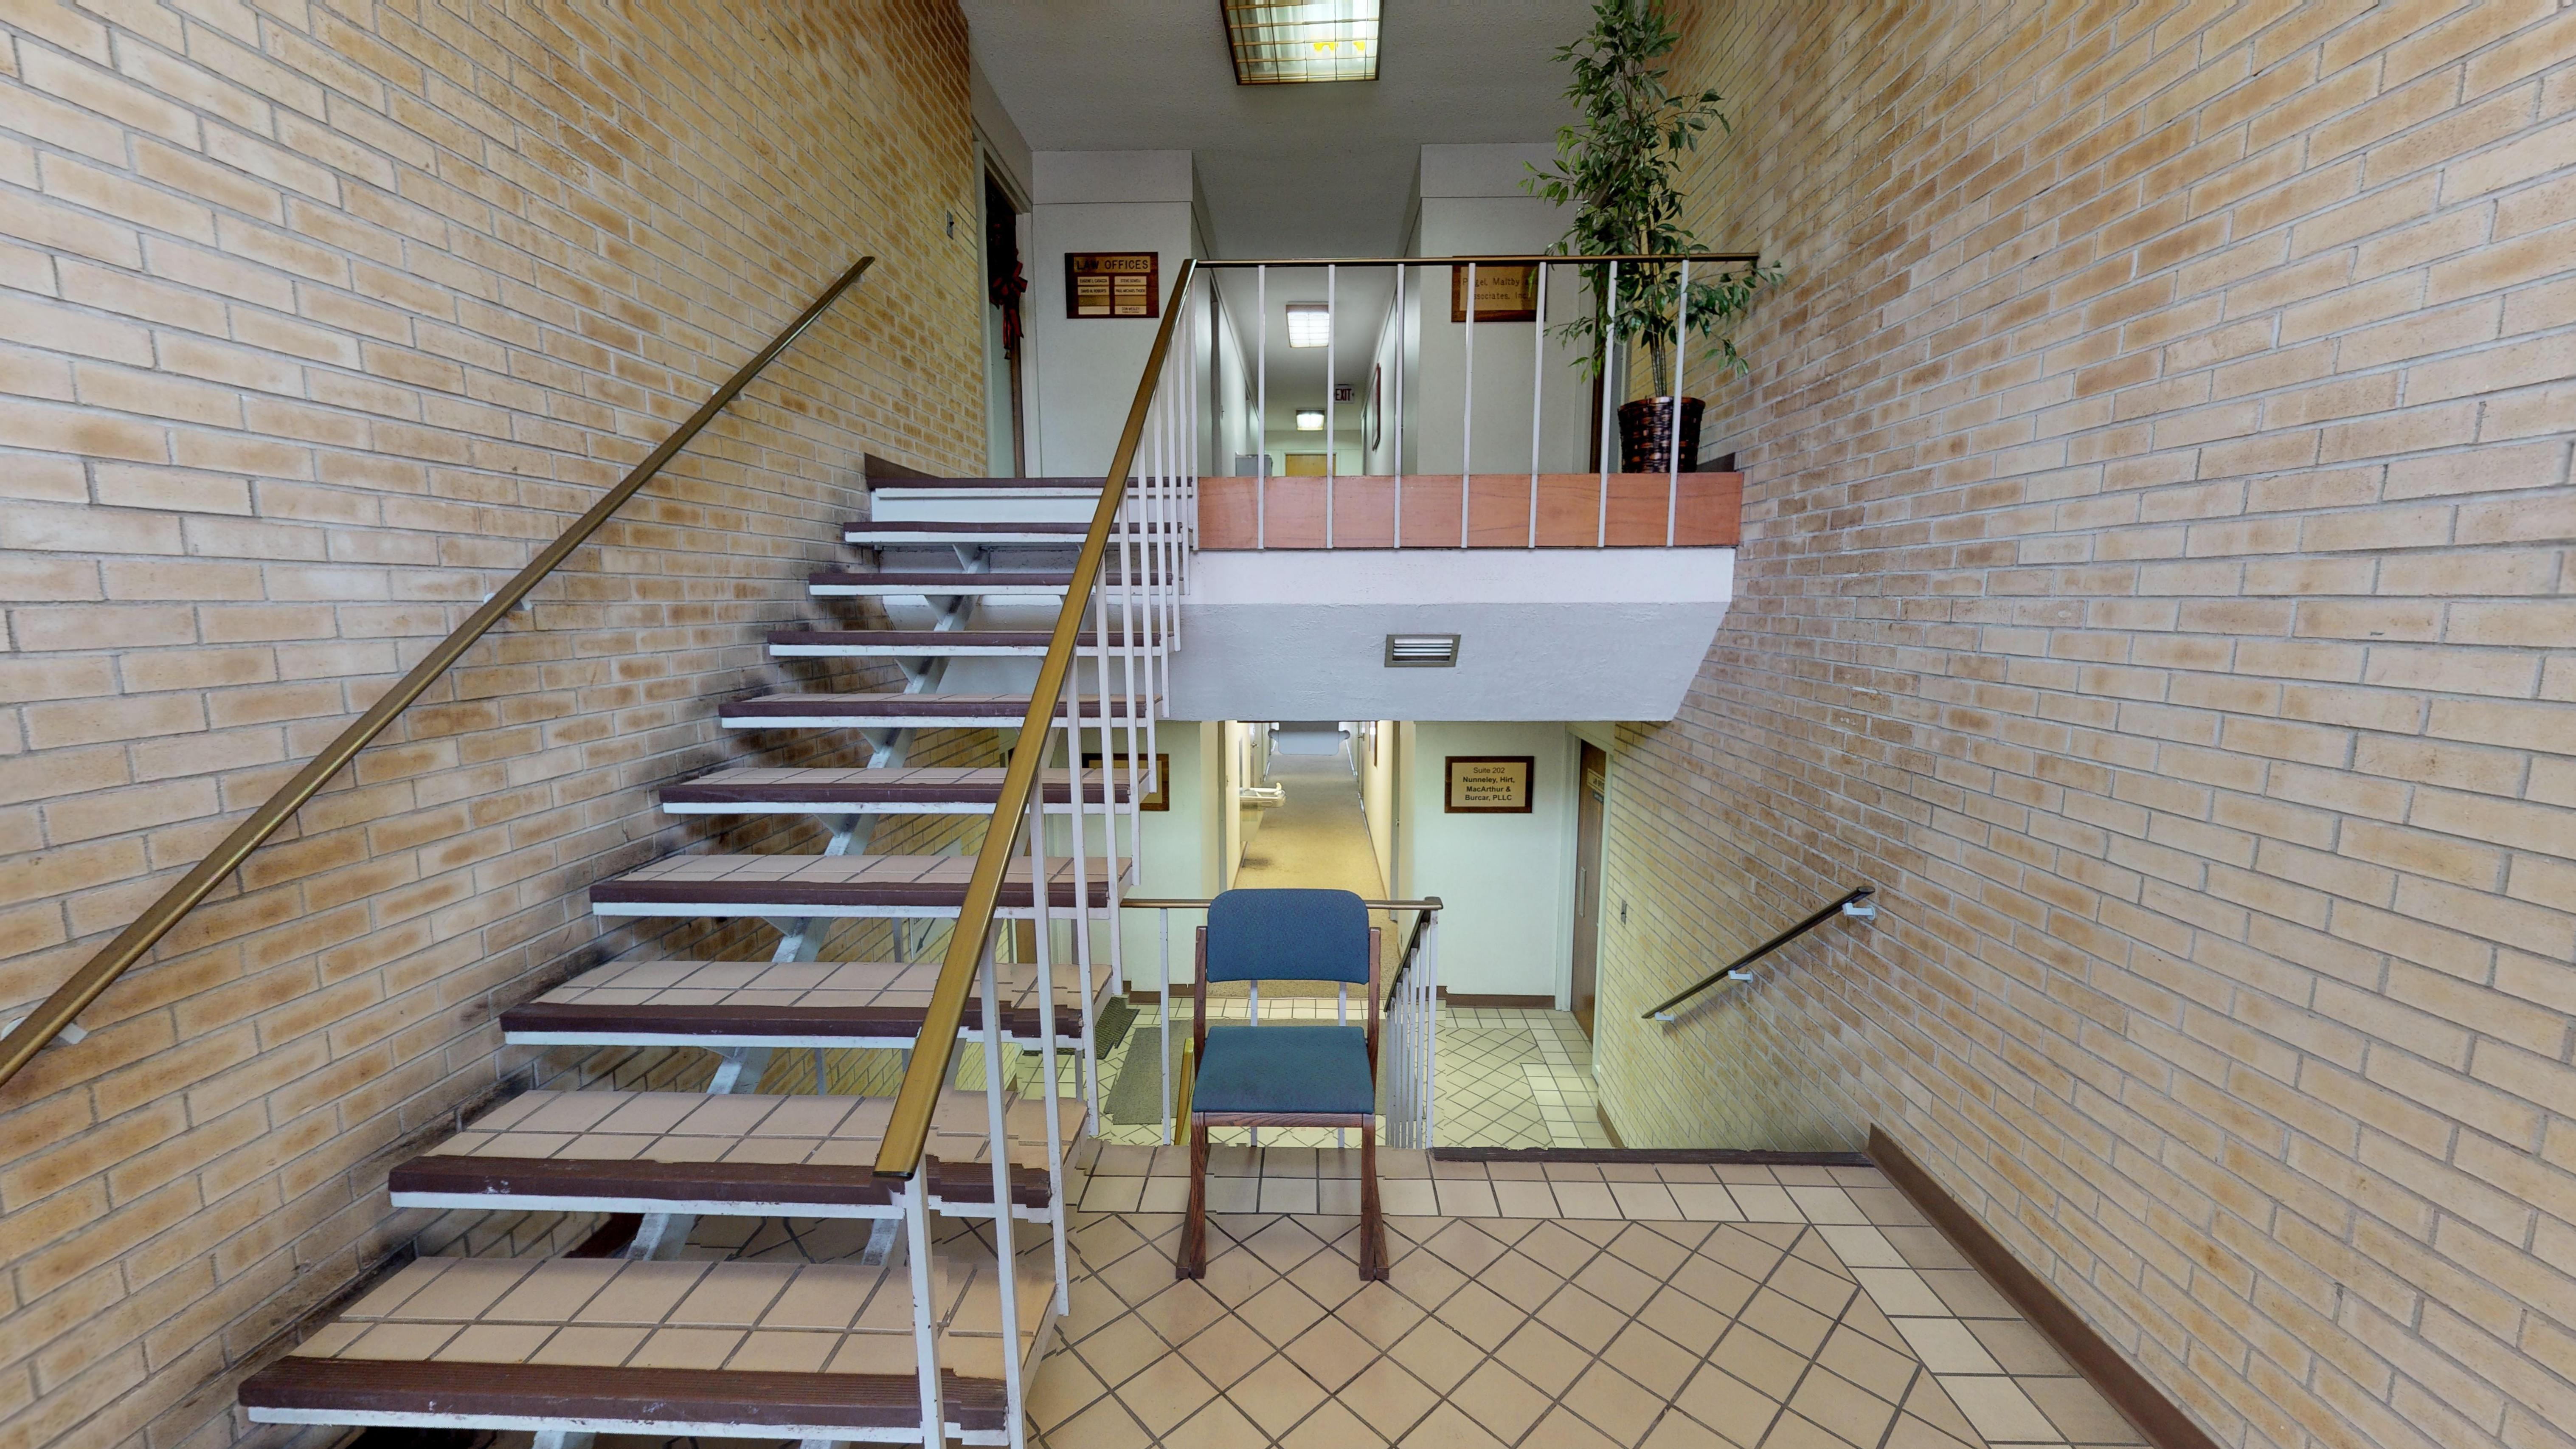 Hallway from Rear Door – Interior